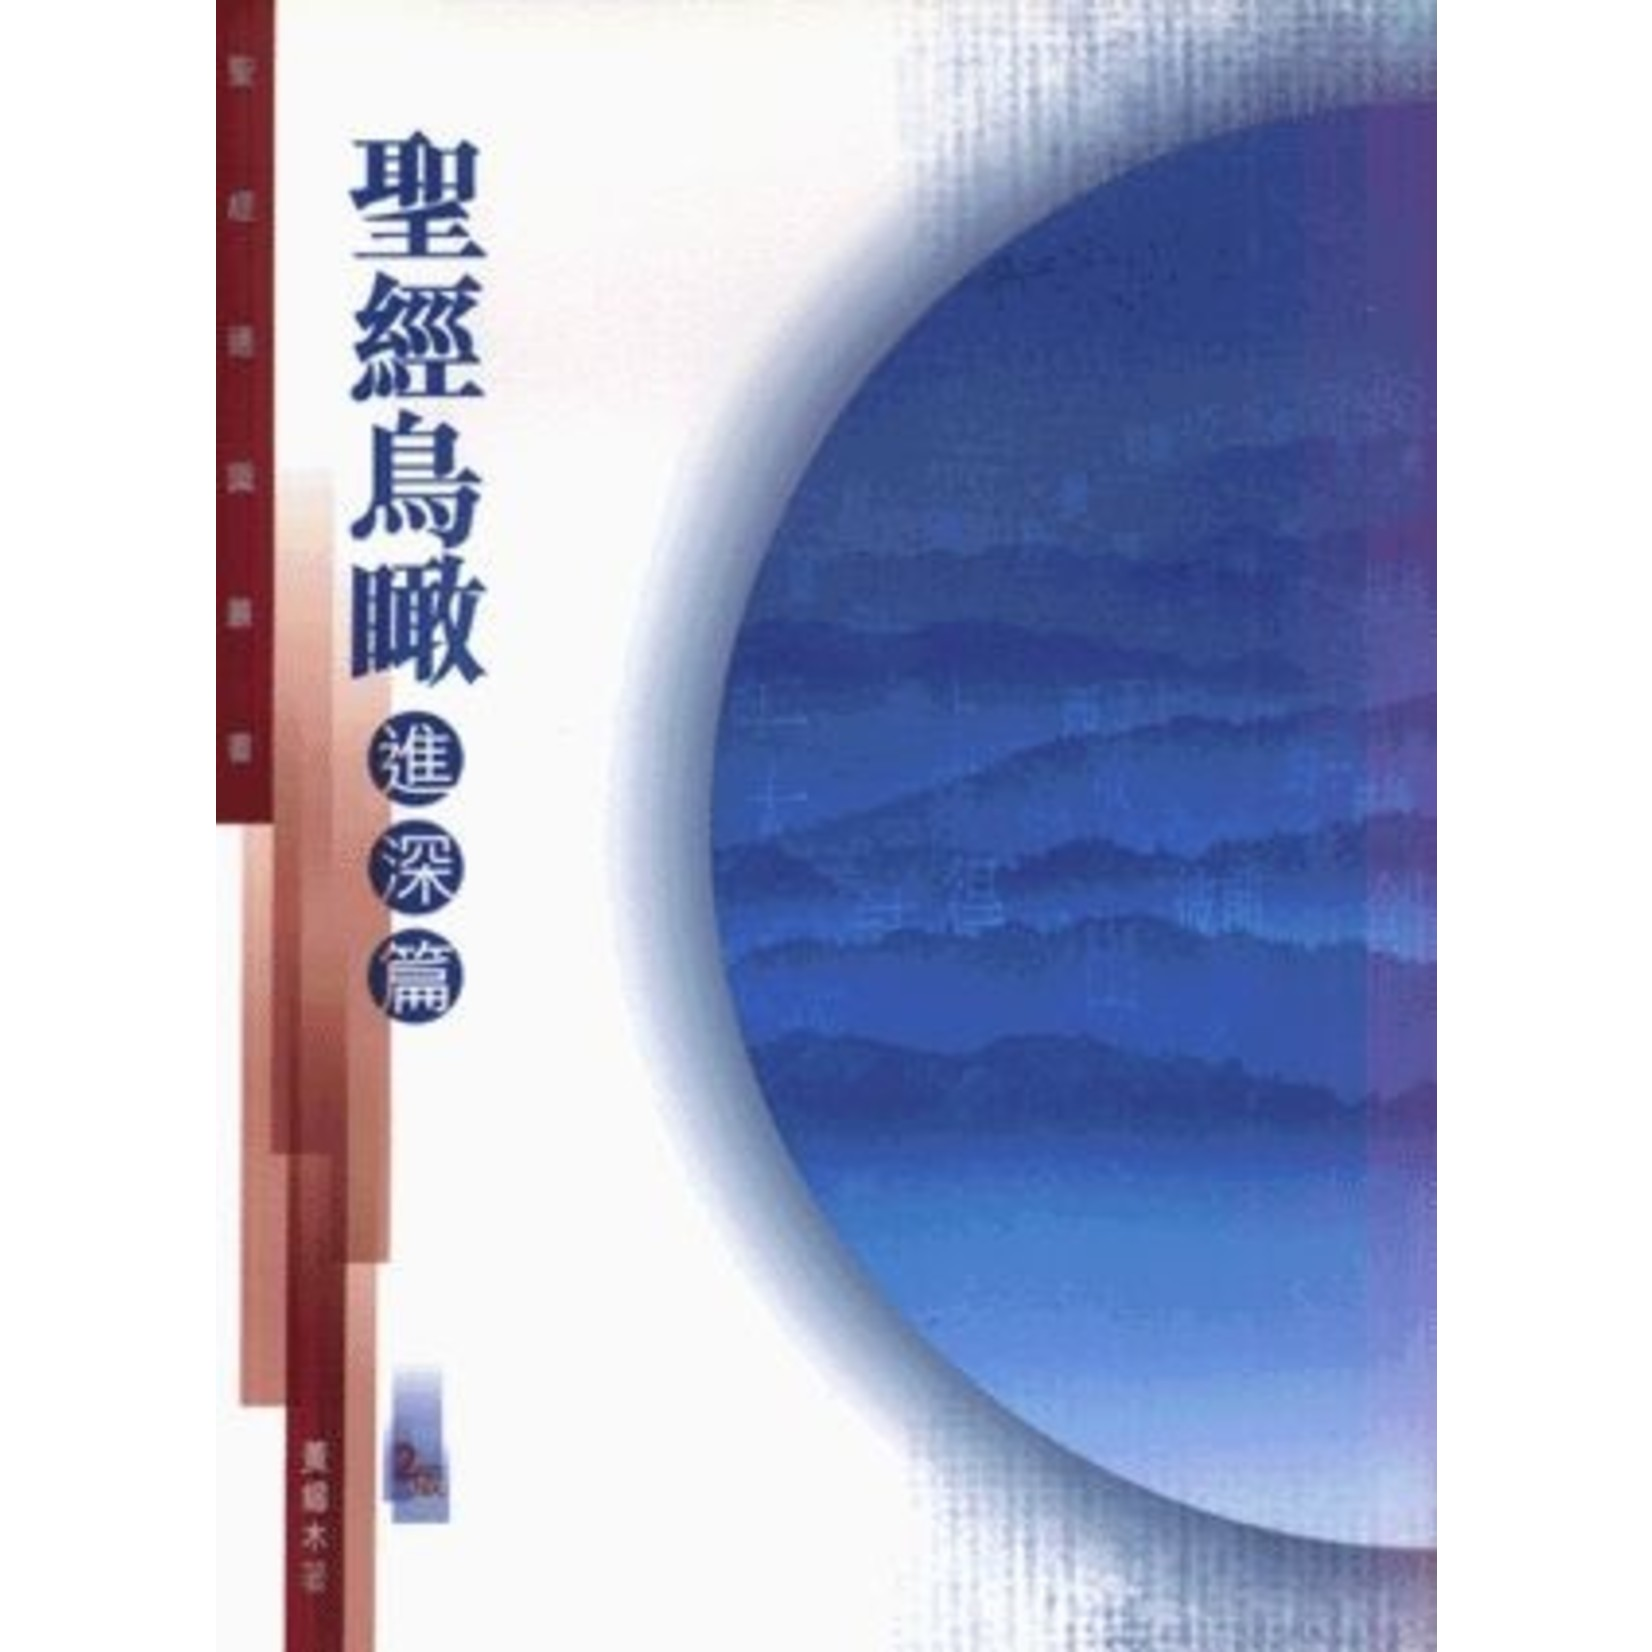 基道 Logos Book House 聖經鳥瞰:進深篇(2版) The Fundamentals of the Bible Advanced Level